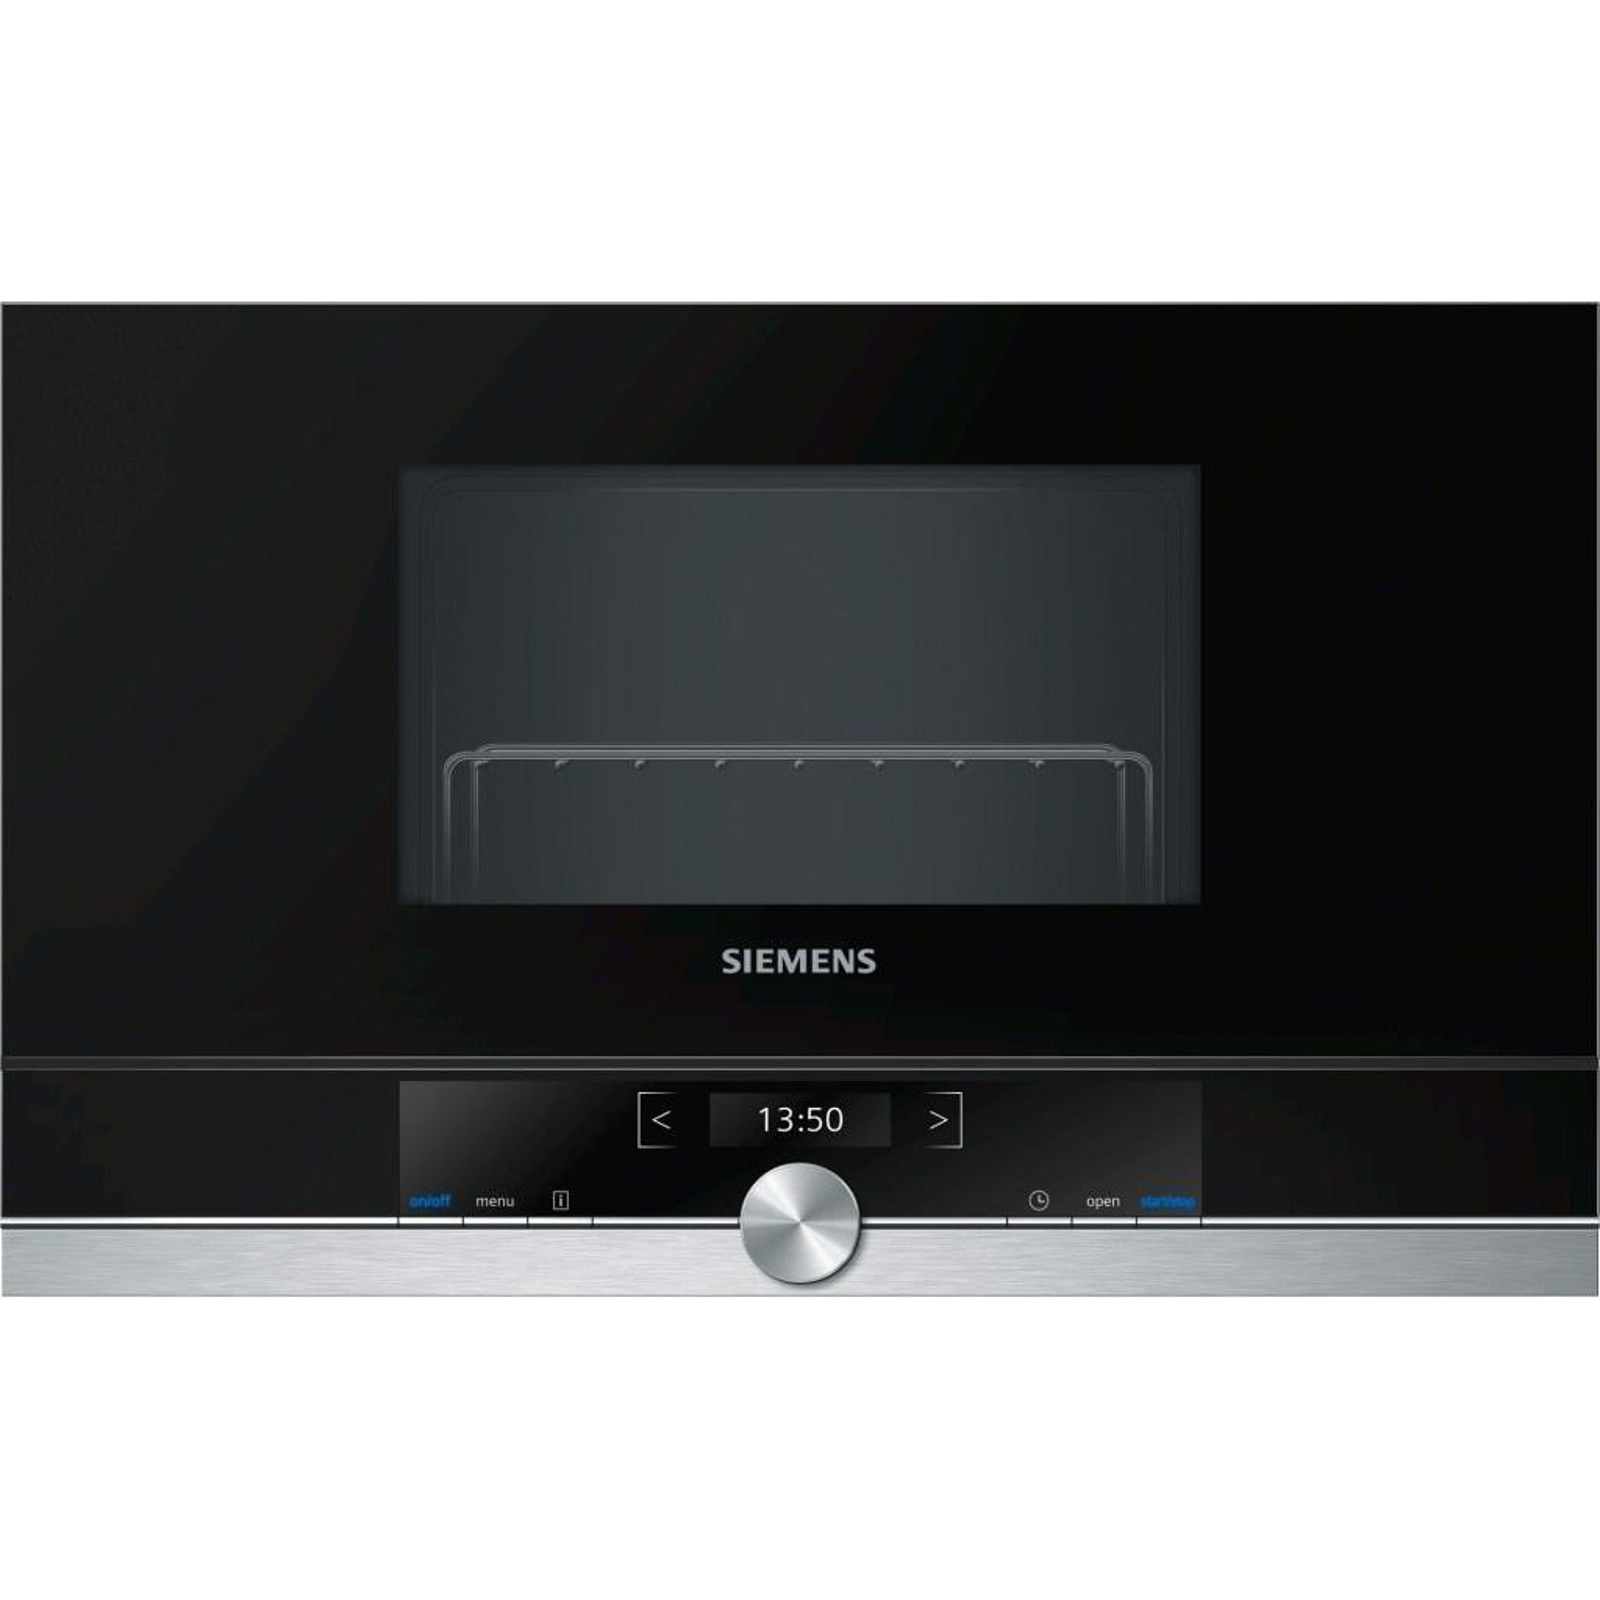 Микроволновая печь Siemens BE 634 LGS1 (BE634LGS1)